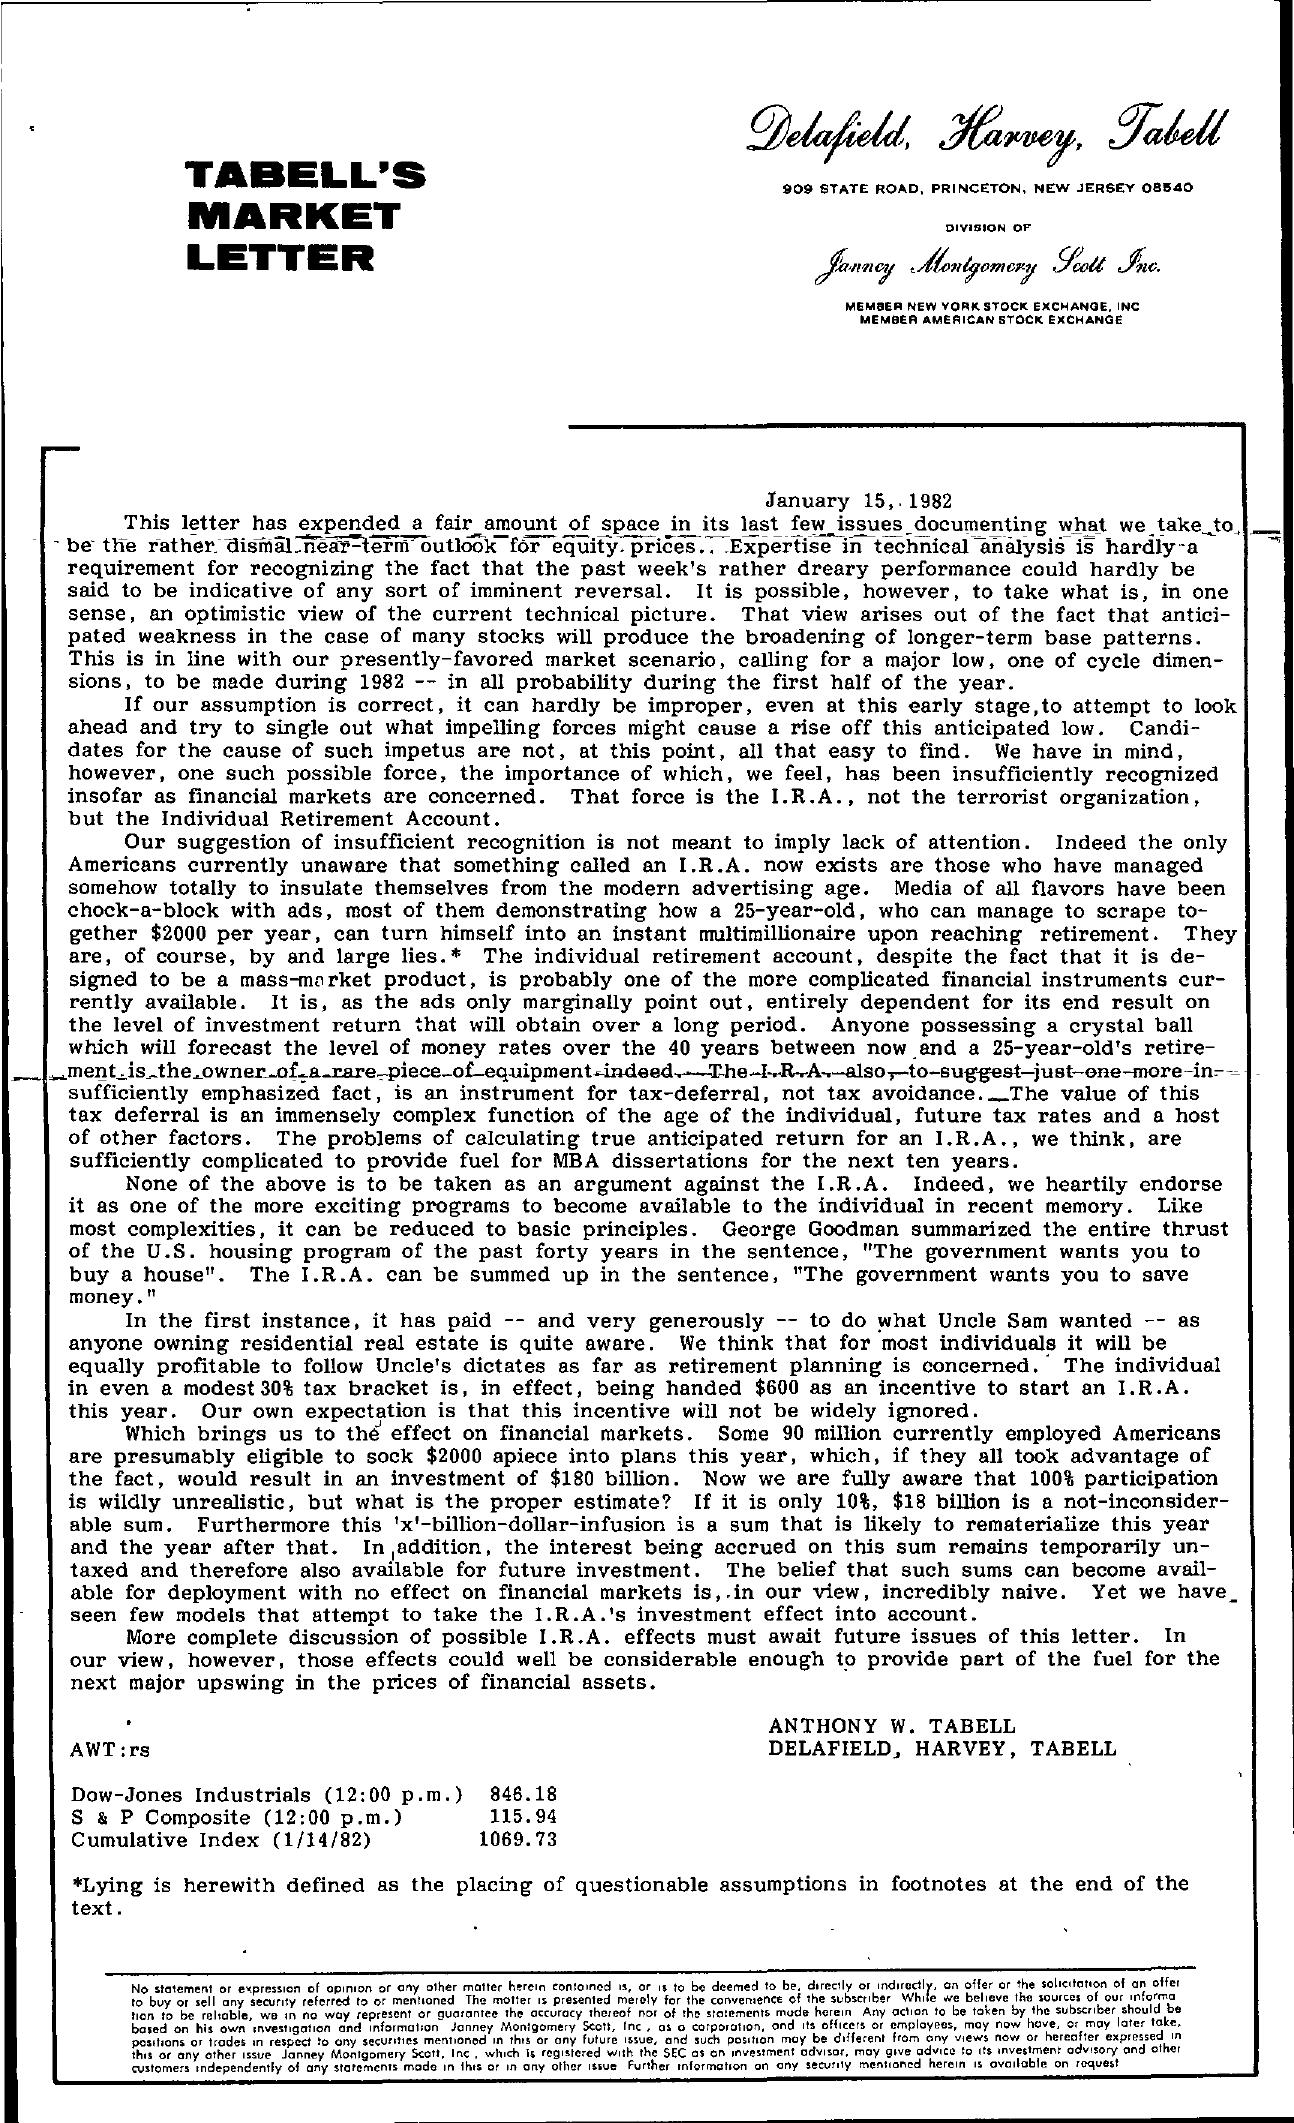 Tabell's Market Letter - January 15, 1982